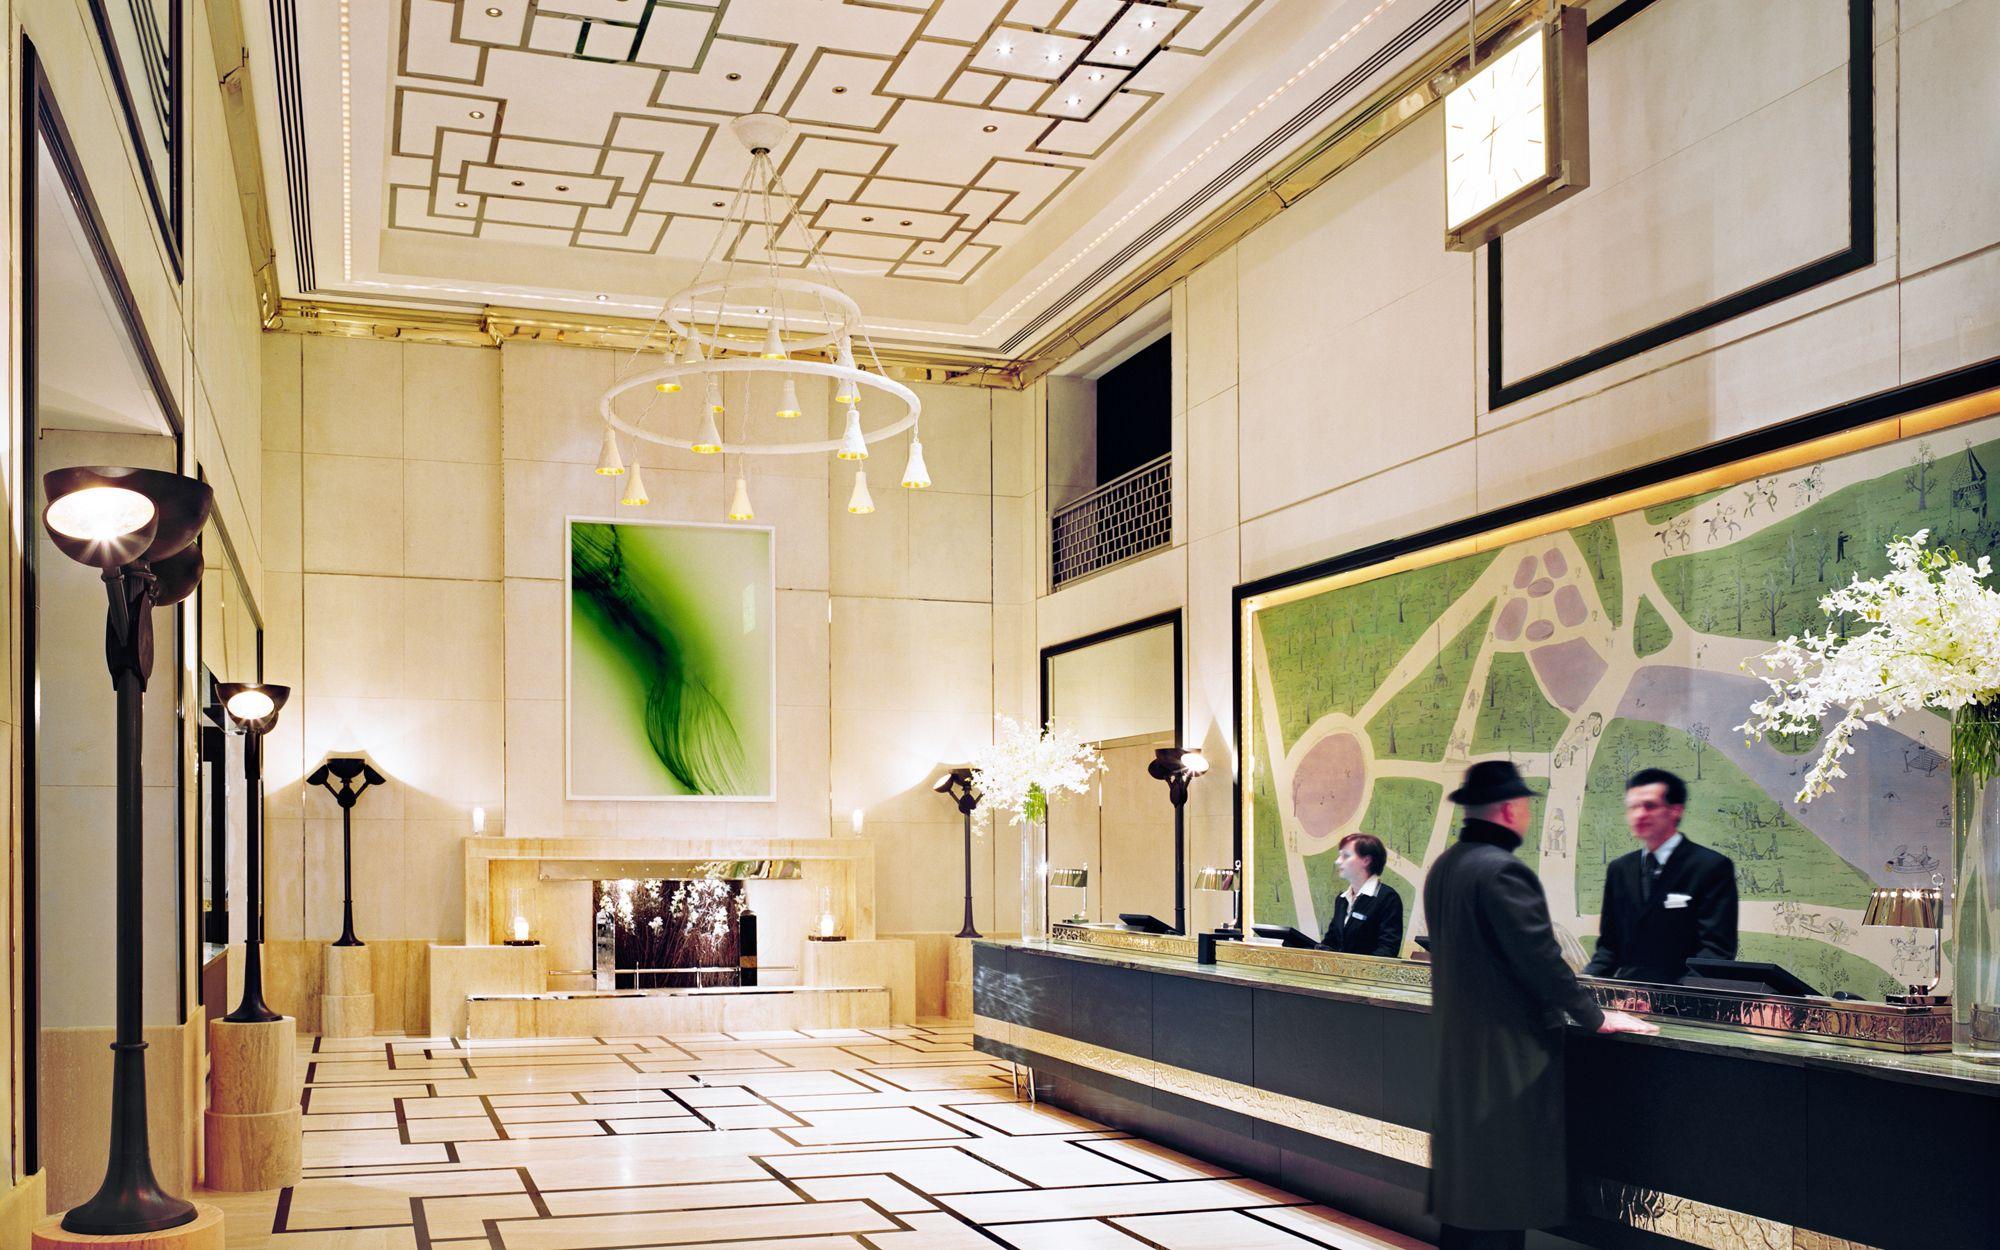 The London Nyc Manhattan New York City Travel Interior Design The London Nyc Nyc London David Collins